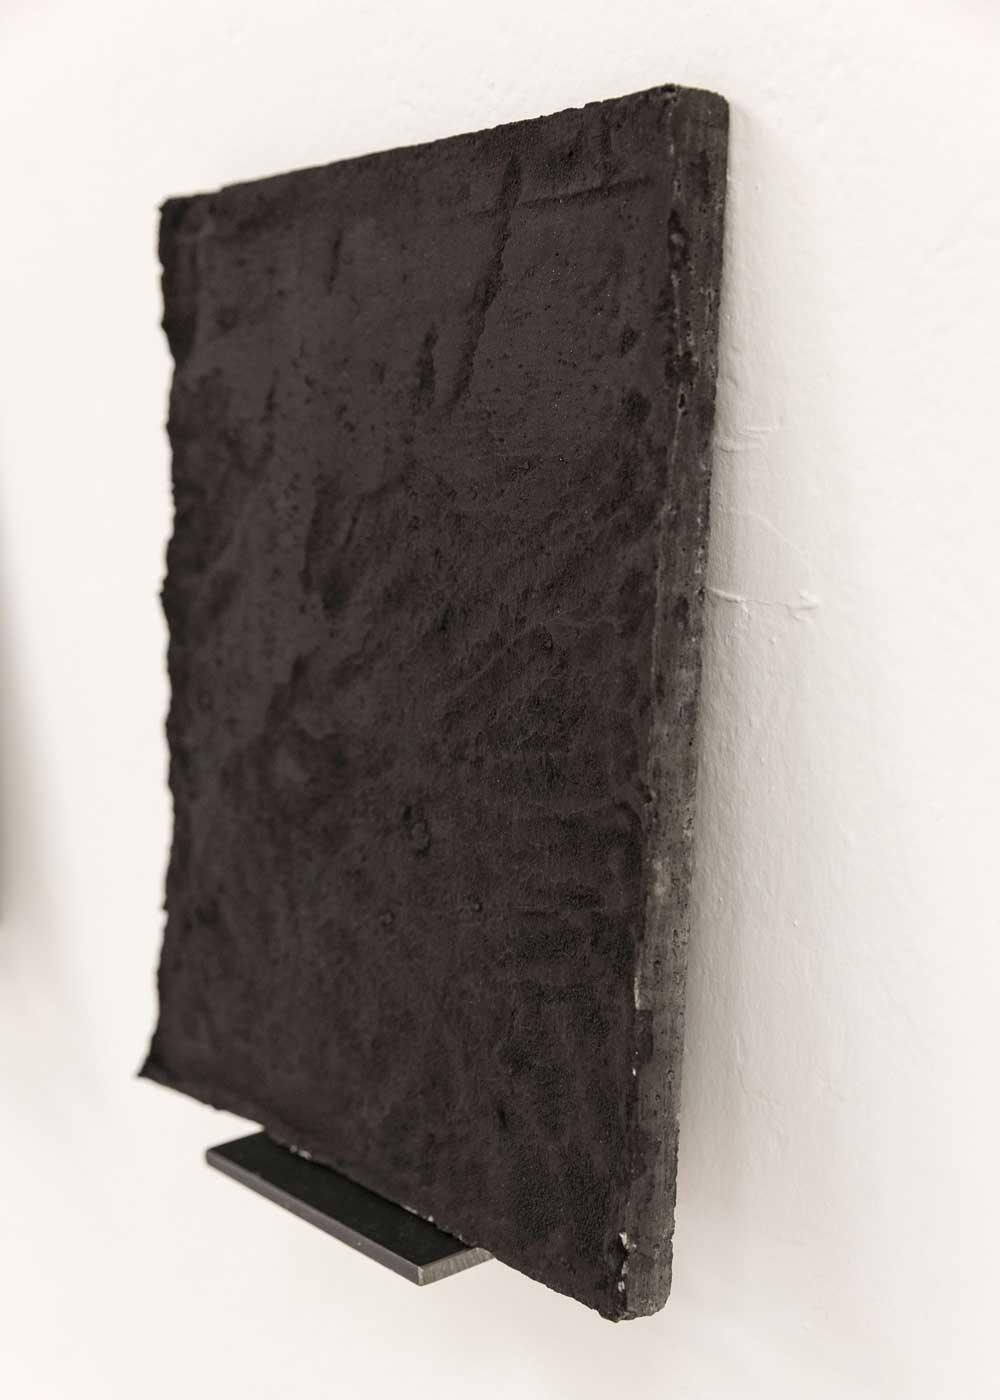 Luka-Jana-Berchtold_ConcreteDreams_black-III_02-c-Melanie-Schneider